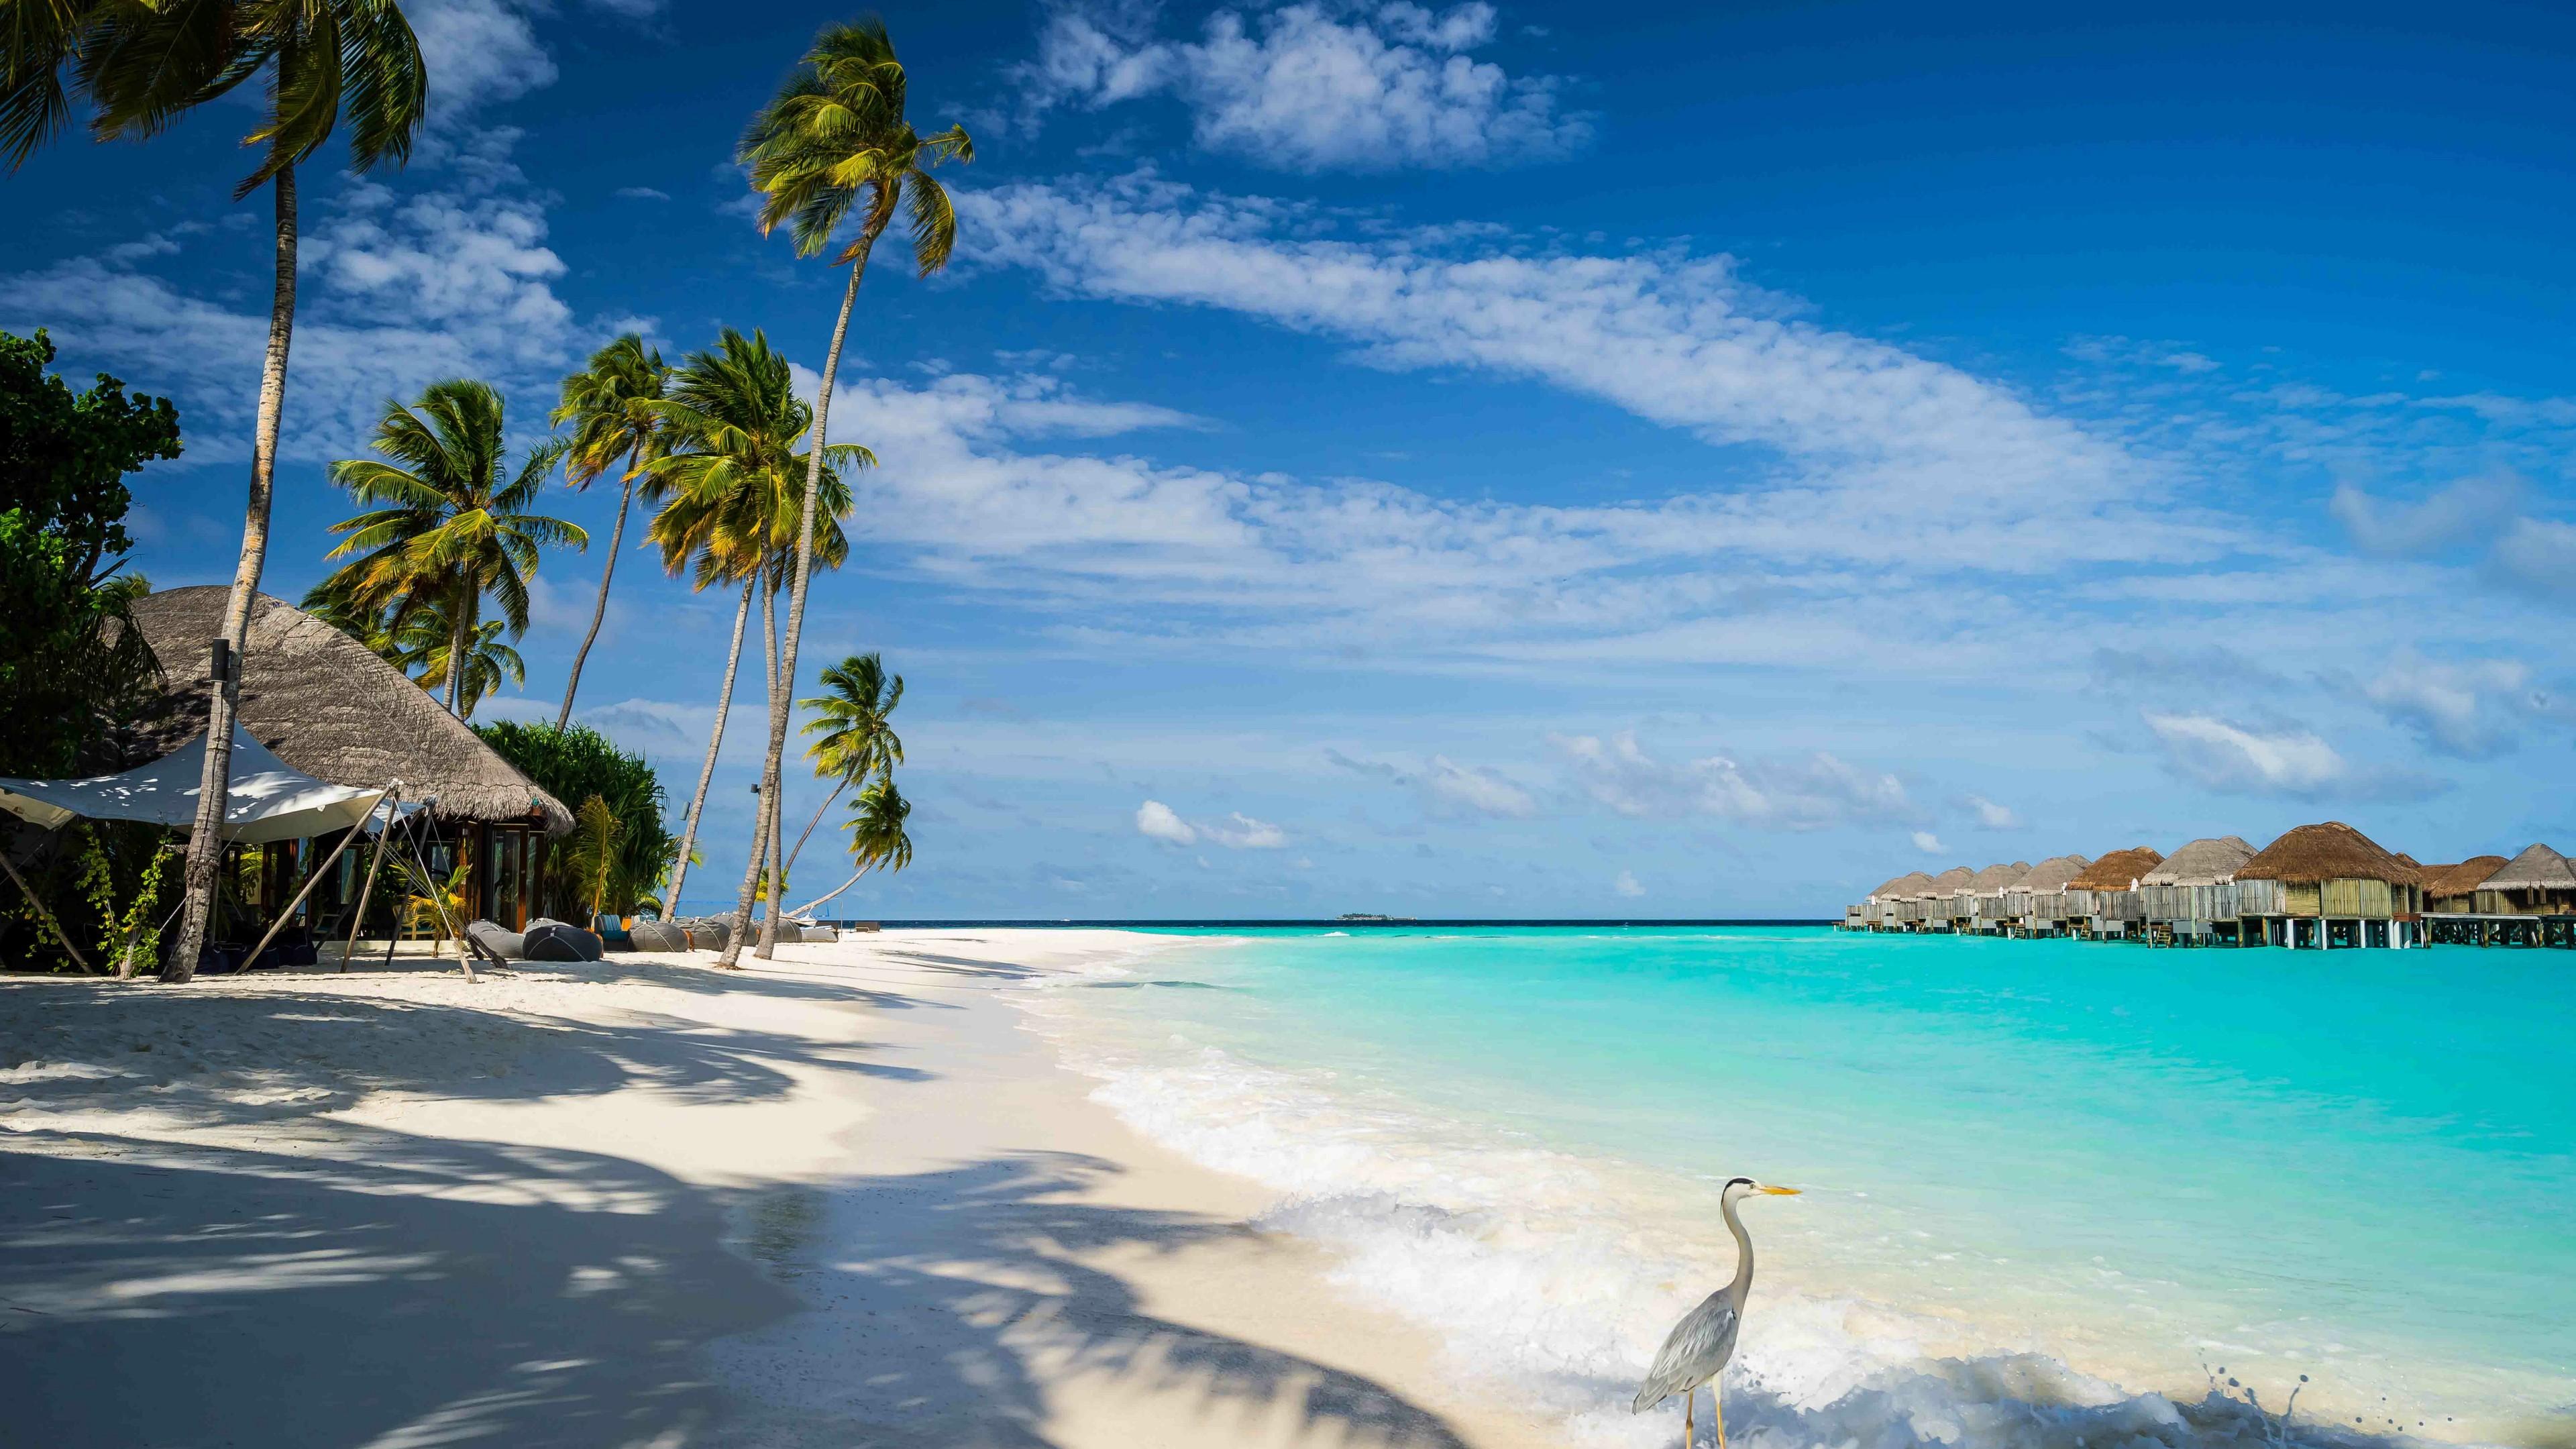 Sandy beach in Maldives wallpaper - backiee